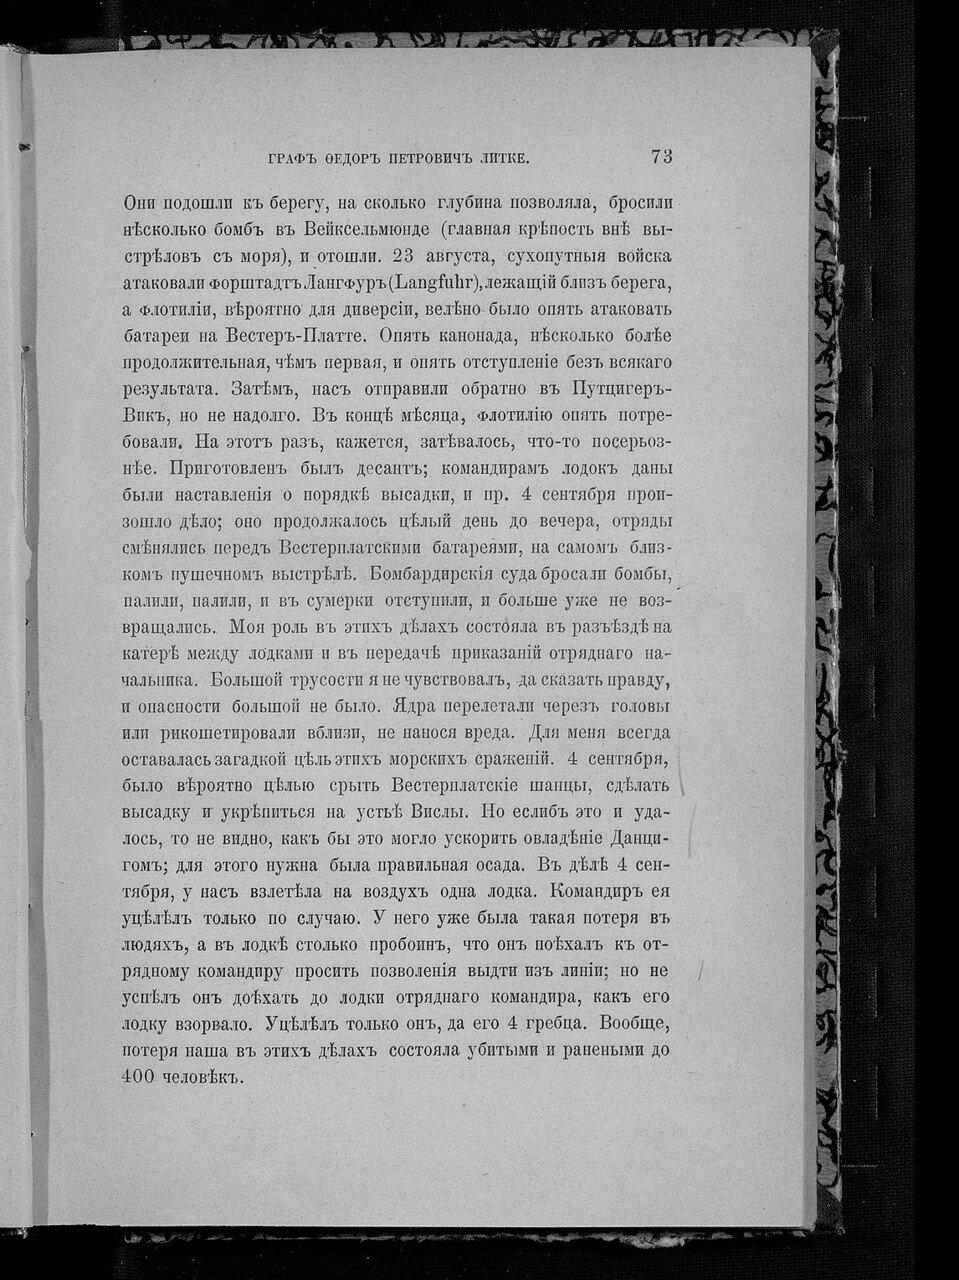 https://img-fotki.yandex.ru/get/516365/199368979.d4/0_21dde8_beecfb29_XXXL.jpg